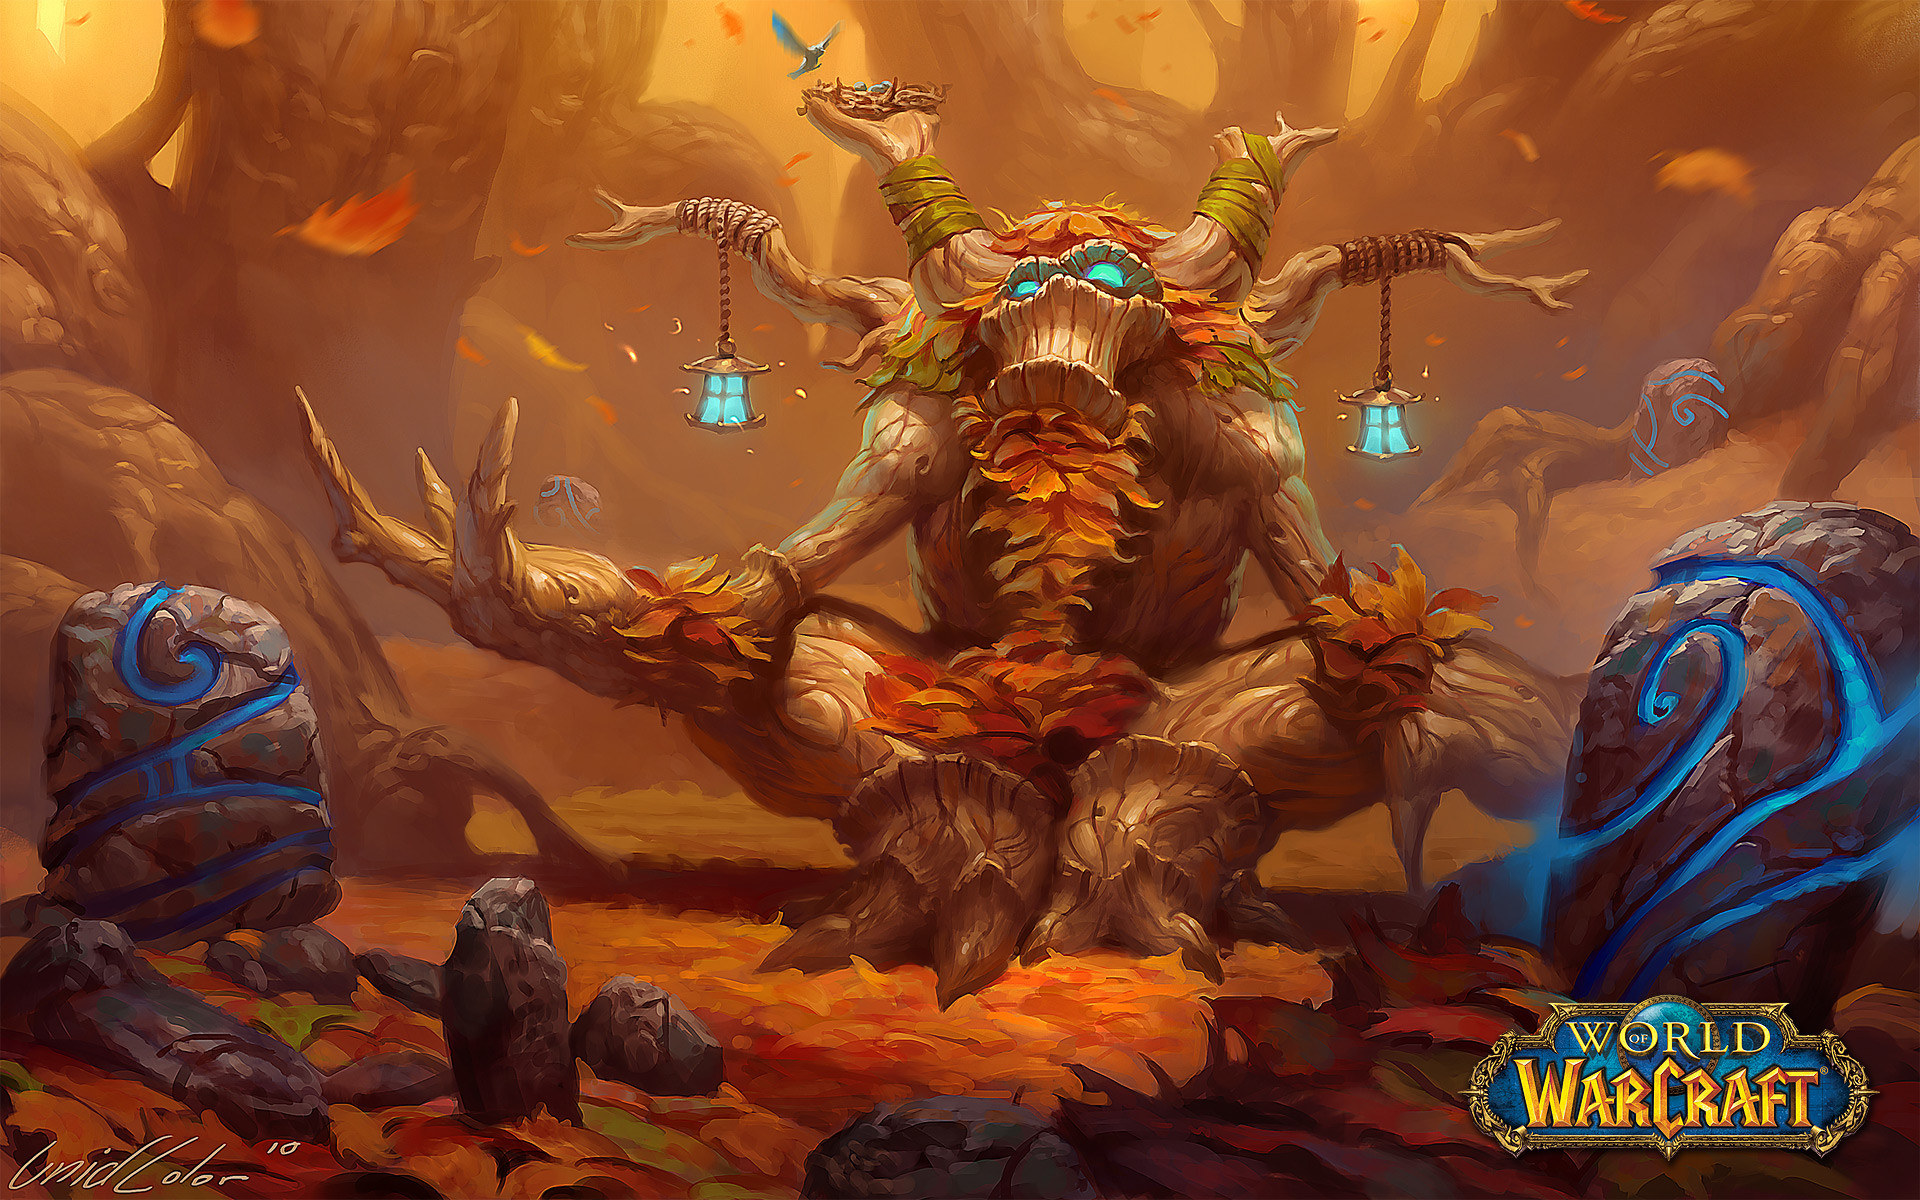 world of warcraft druid world of warcraft christmas world of warcraft .